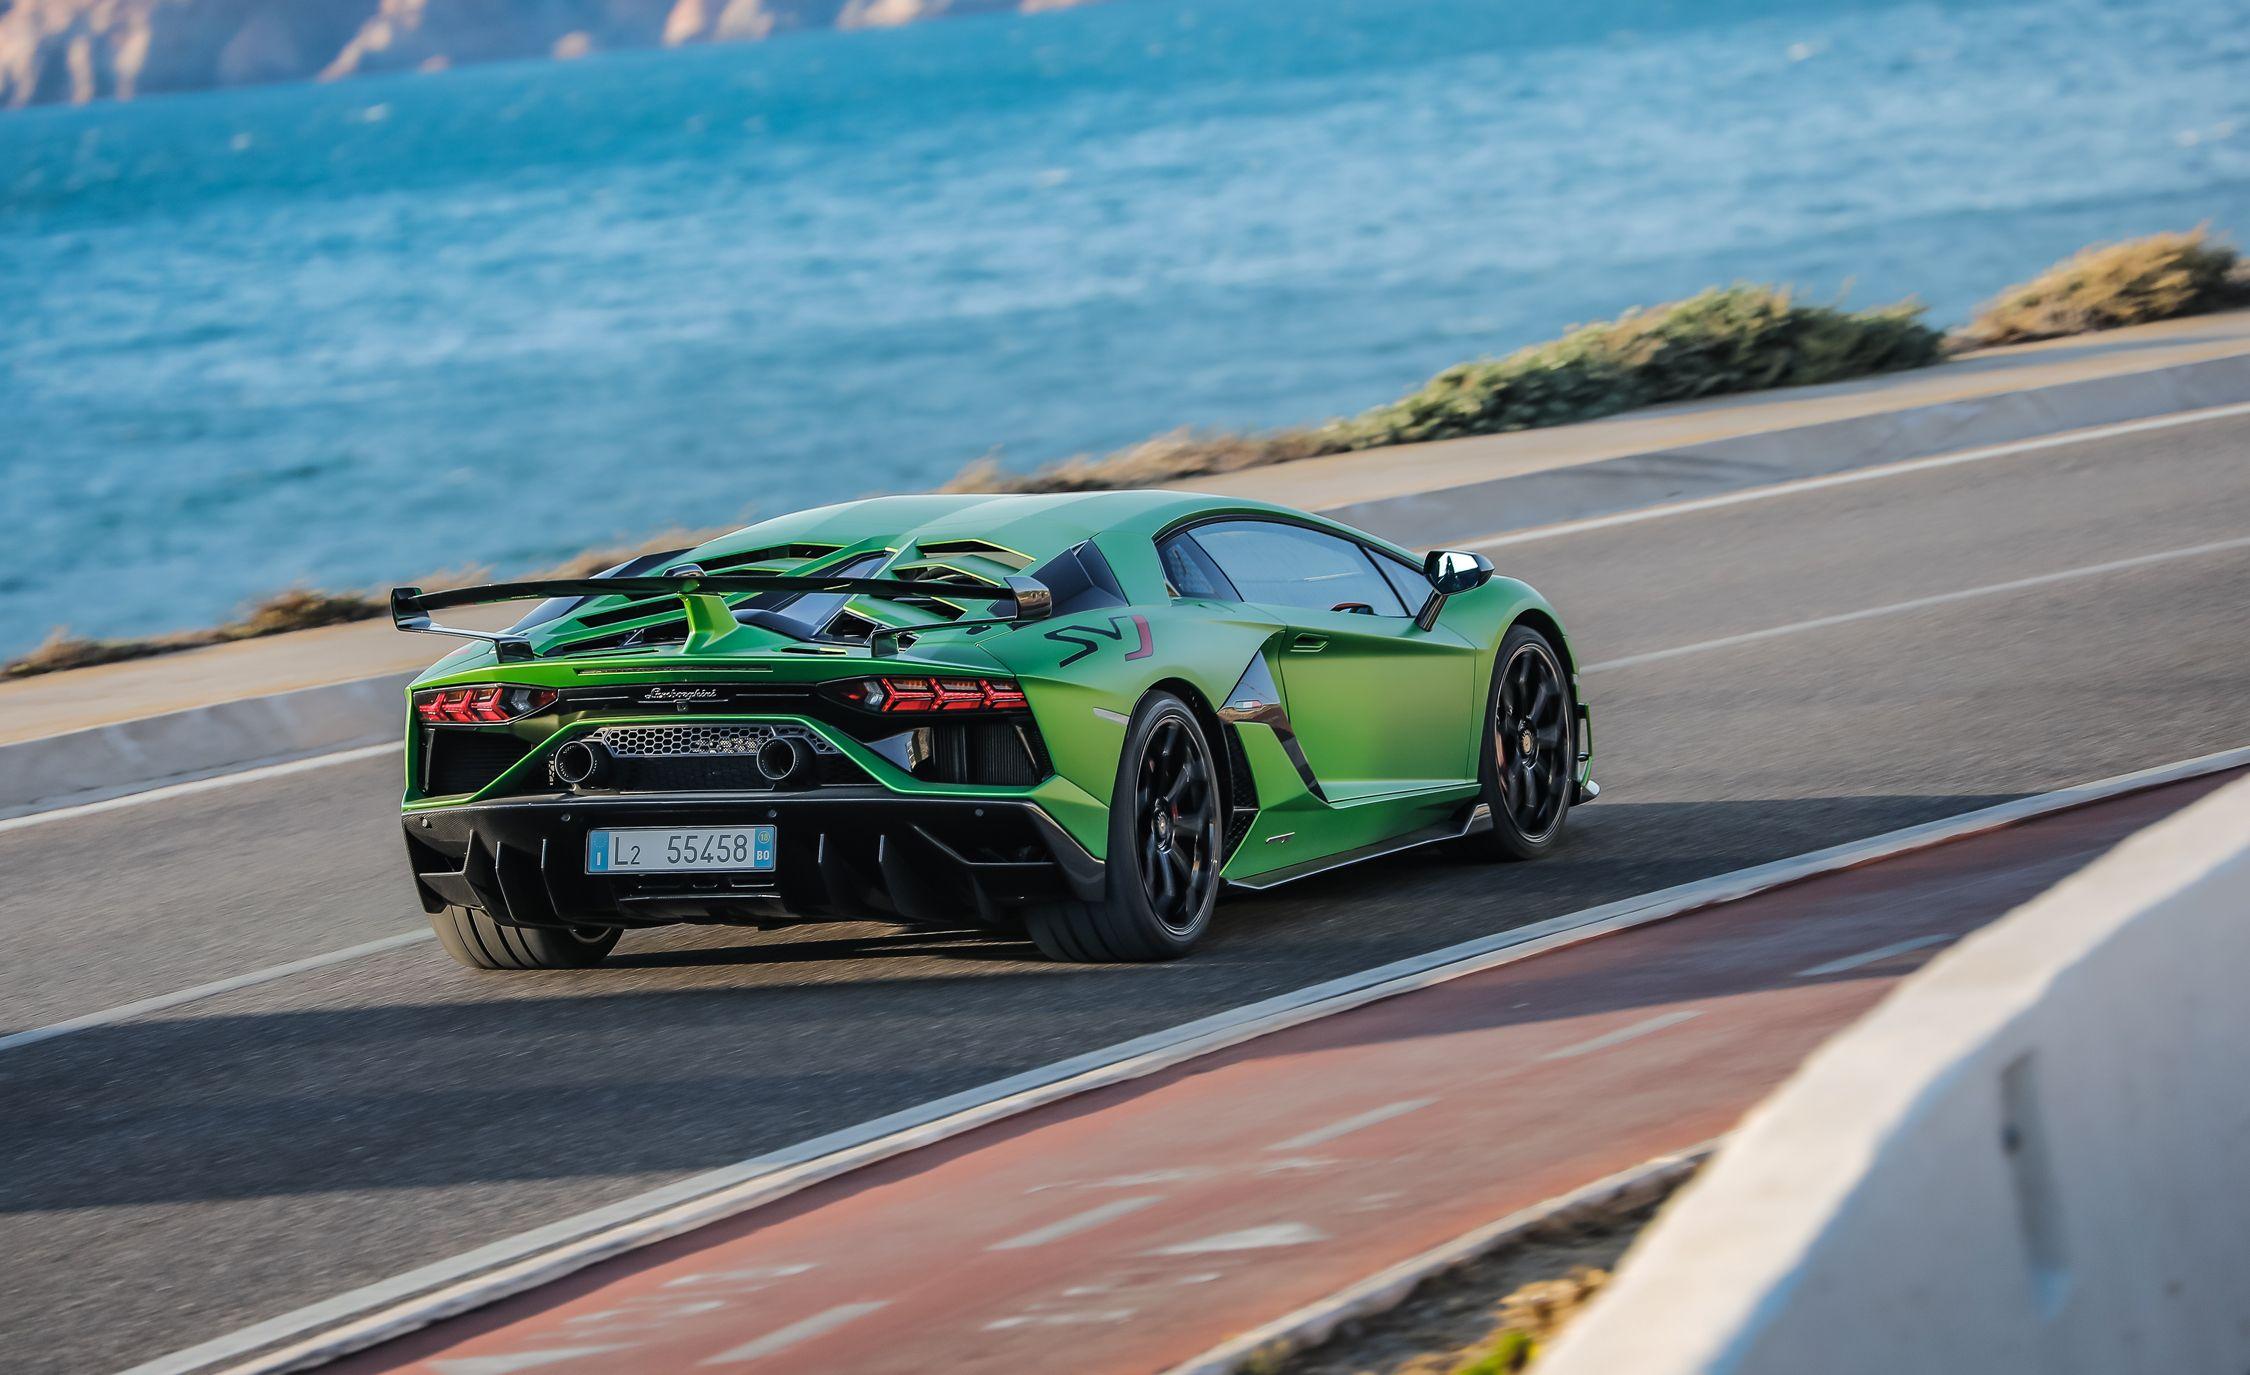 Lamborghini Aventador Svj The Fury Of A 759 Horsepower V 12